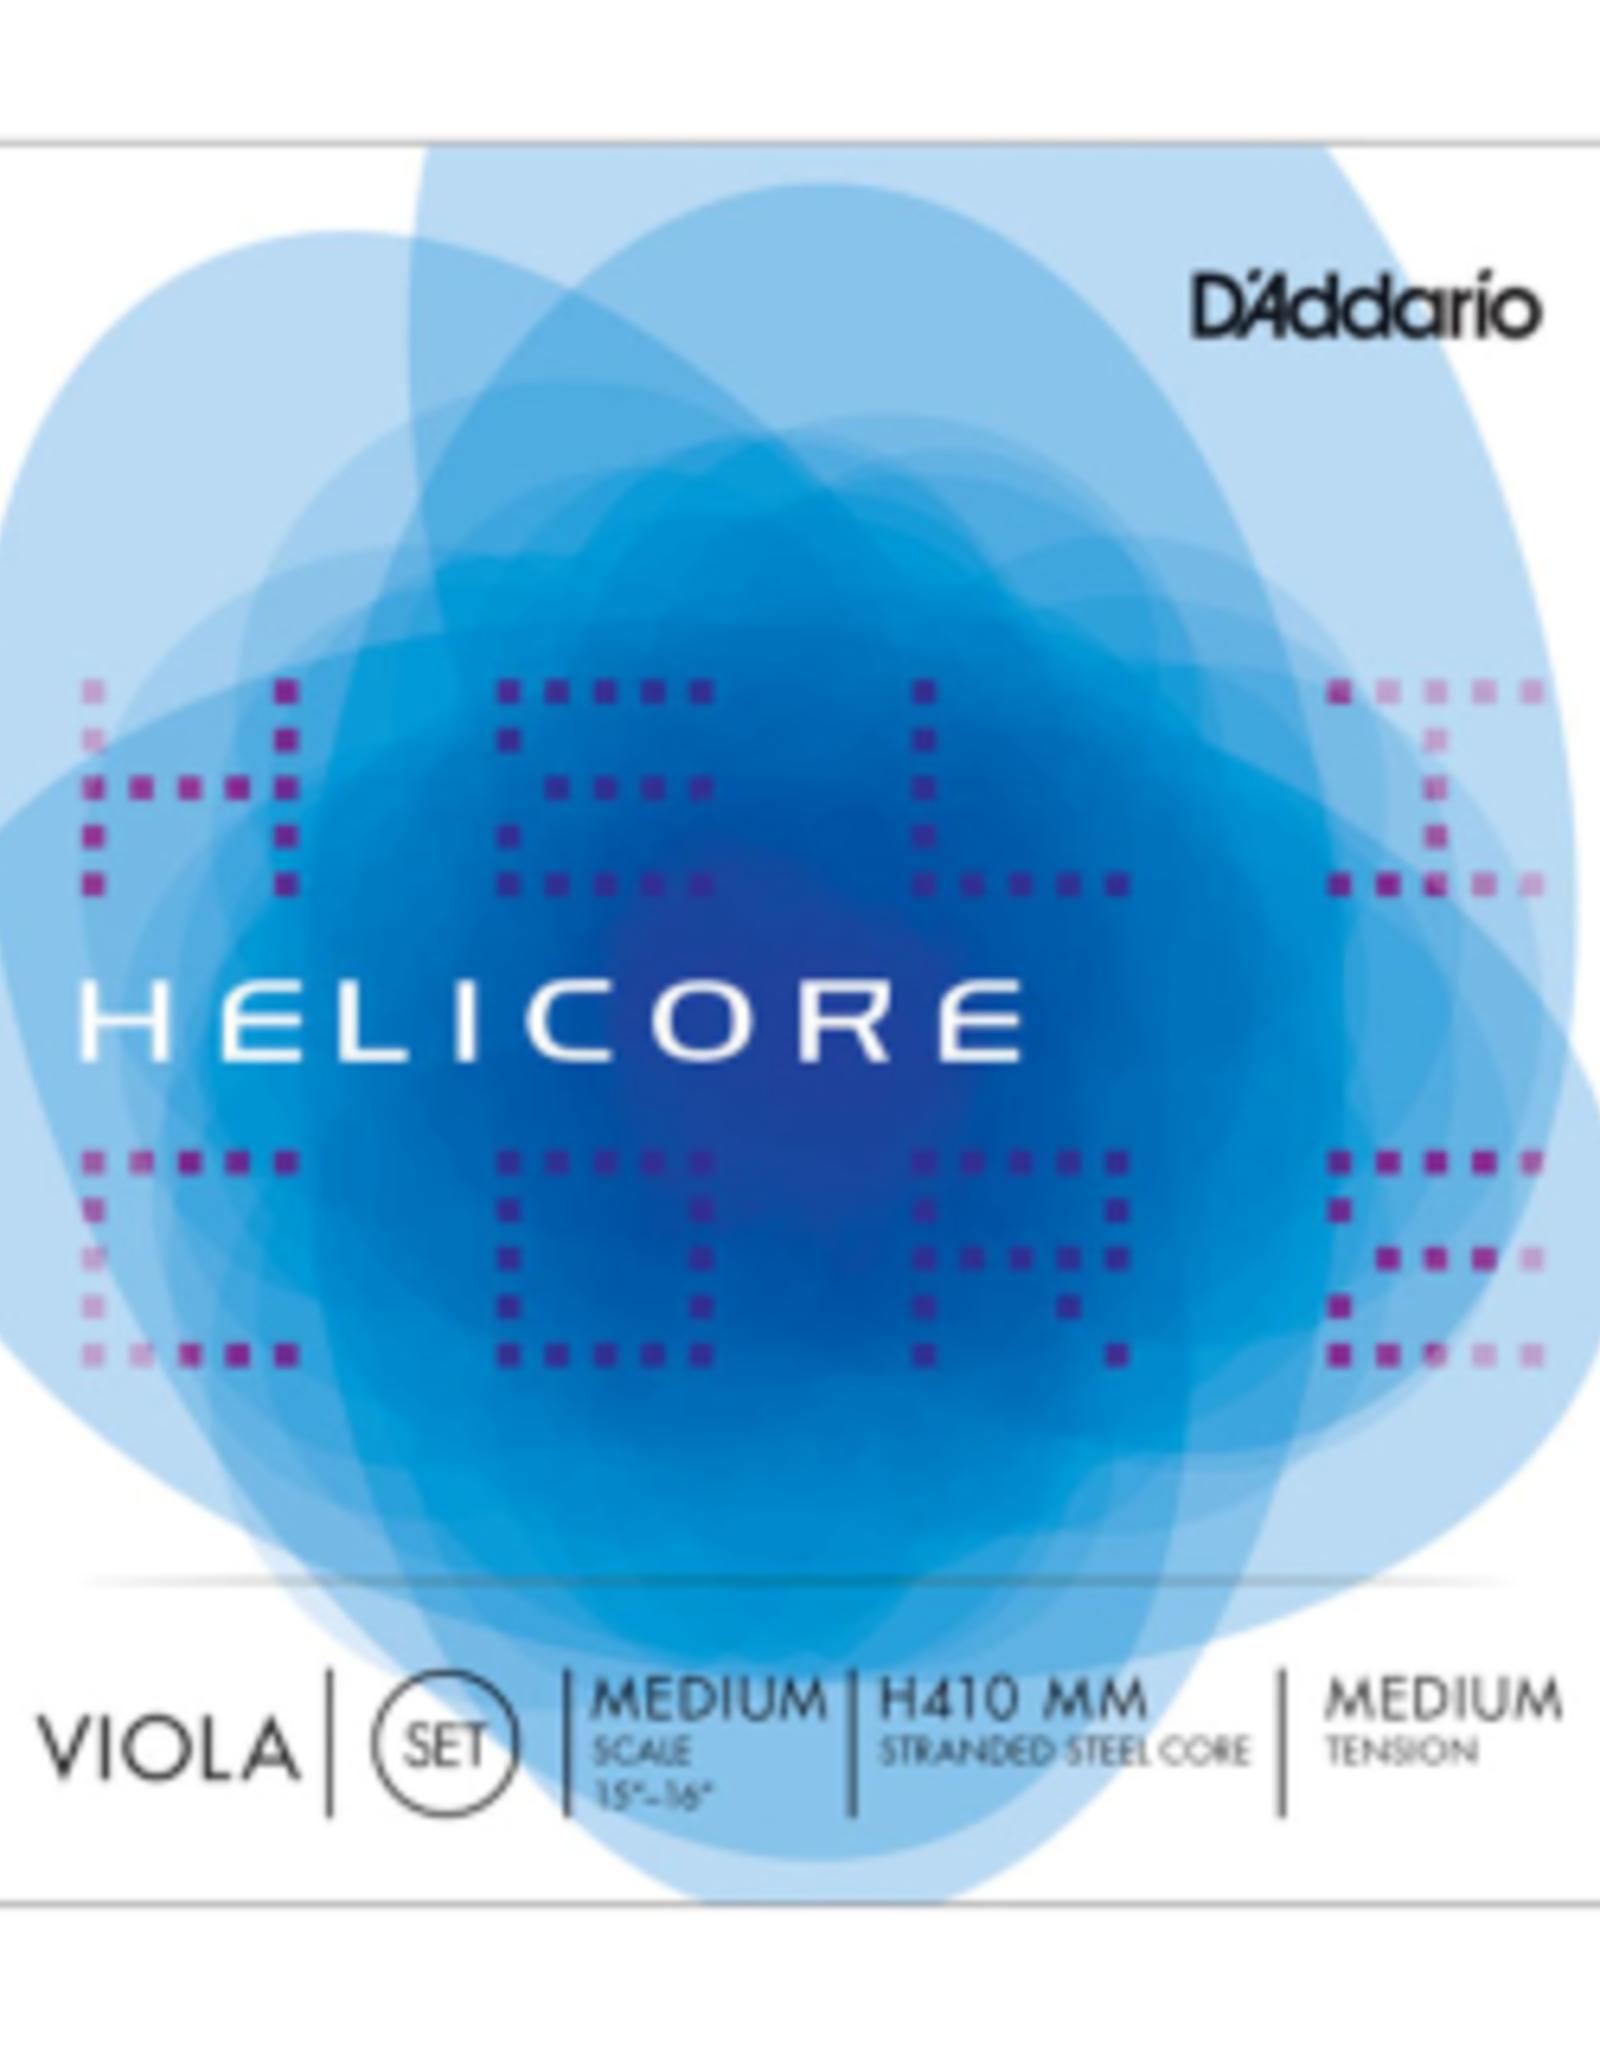 DADDARIO Helicore snarenset voor altviool  15 -16 M , medium